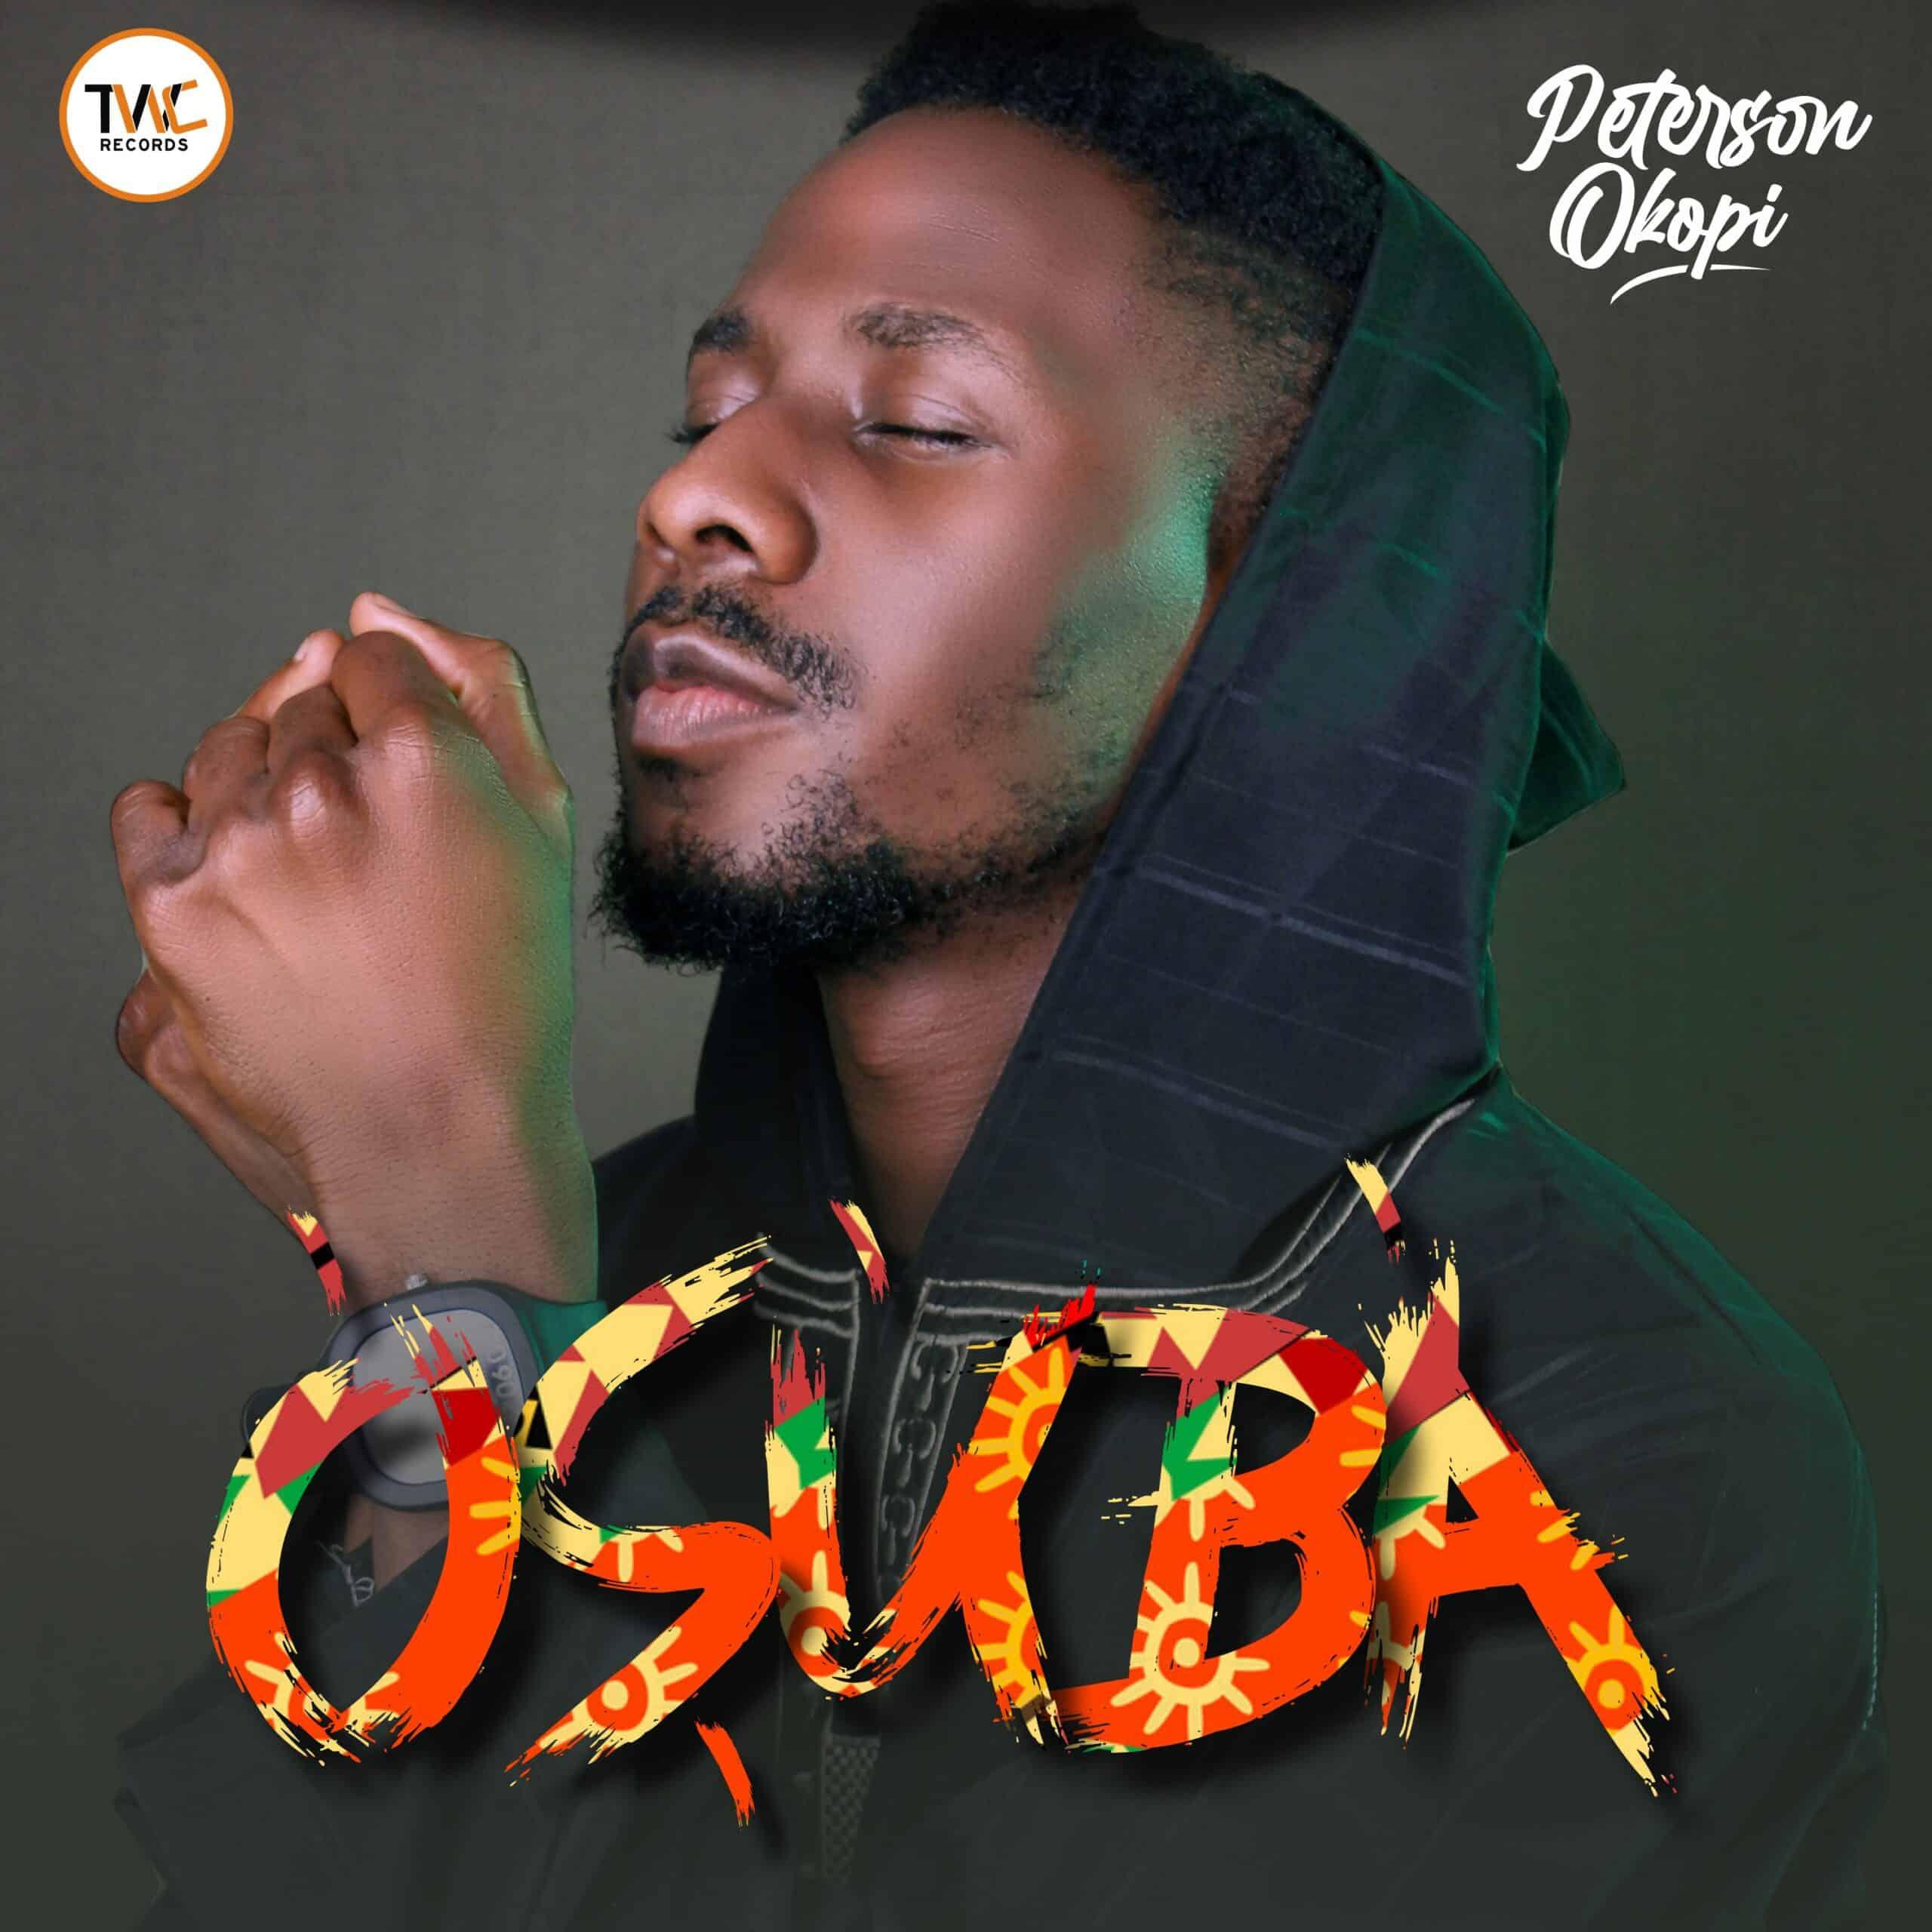 OSUBA ALBUM PETERSON OKOPI